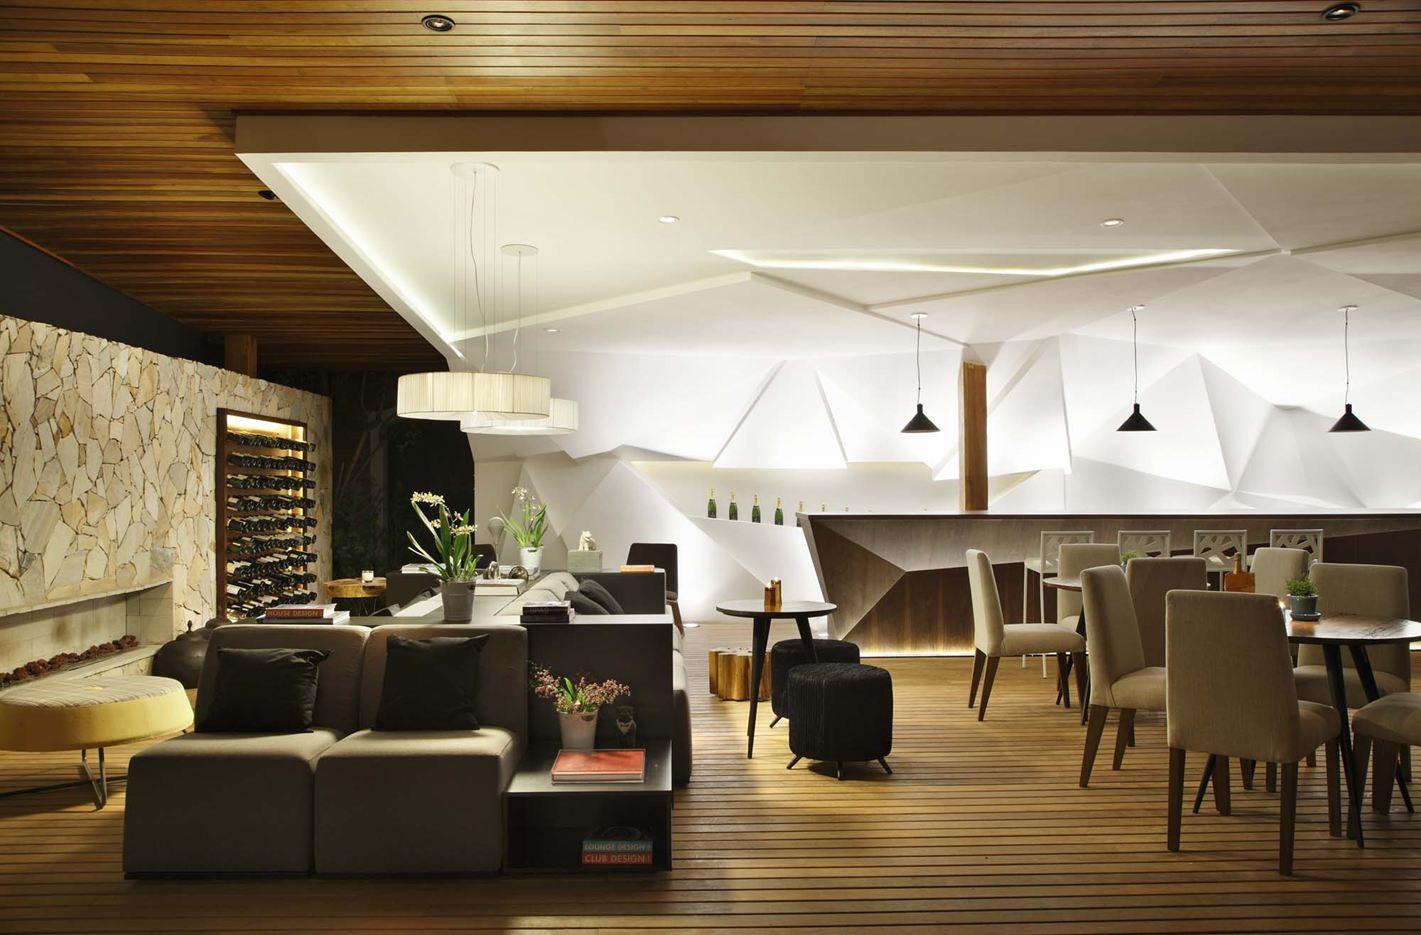 Nosotros bar in campinas brazil by studio otto felix for Arredamento bari